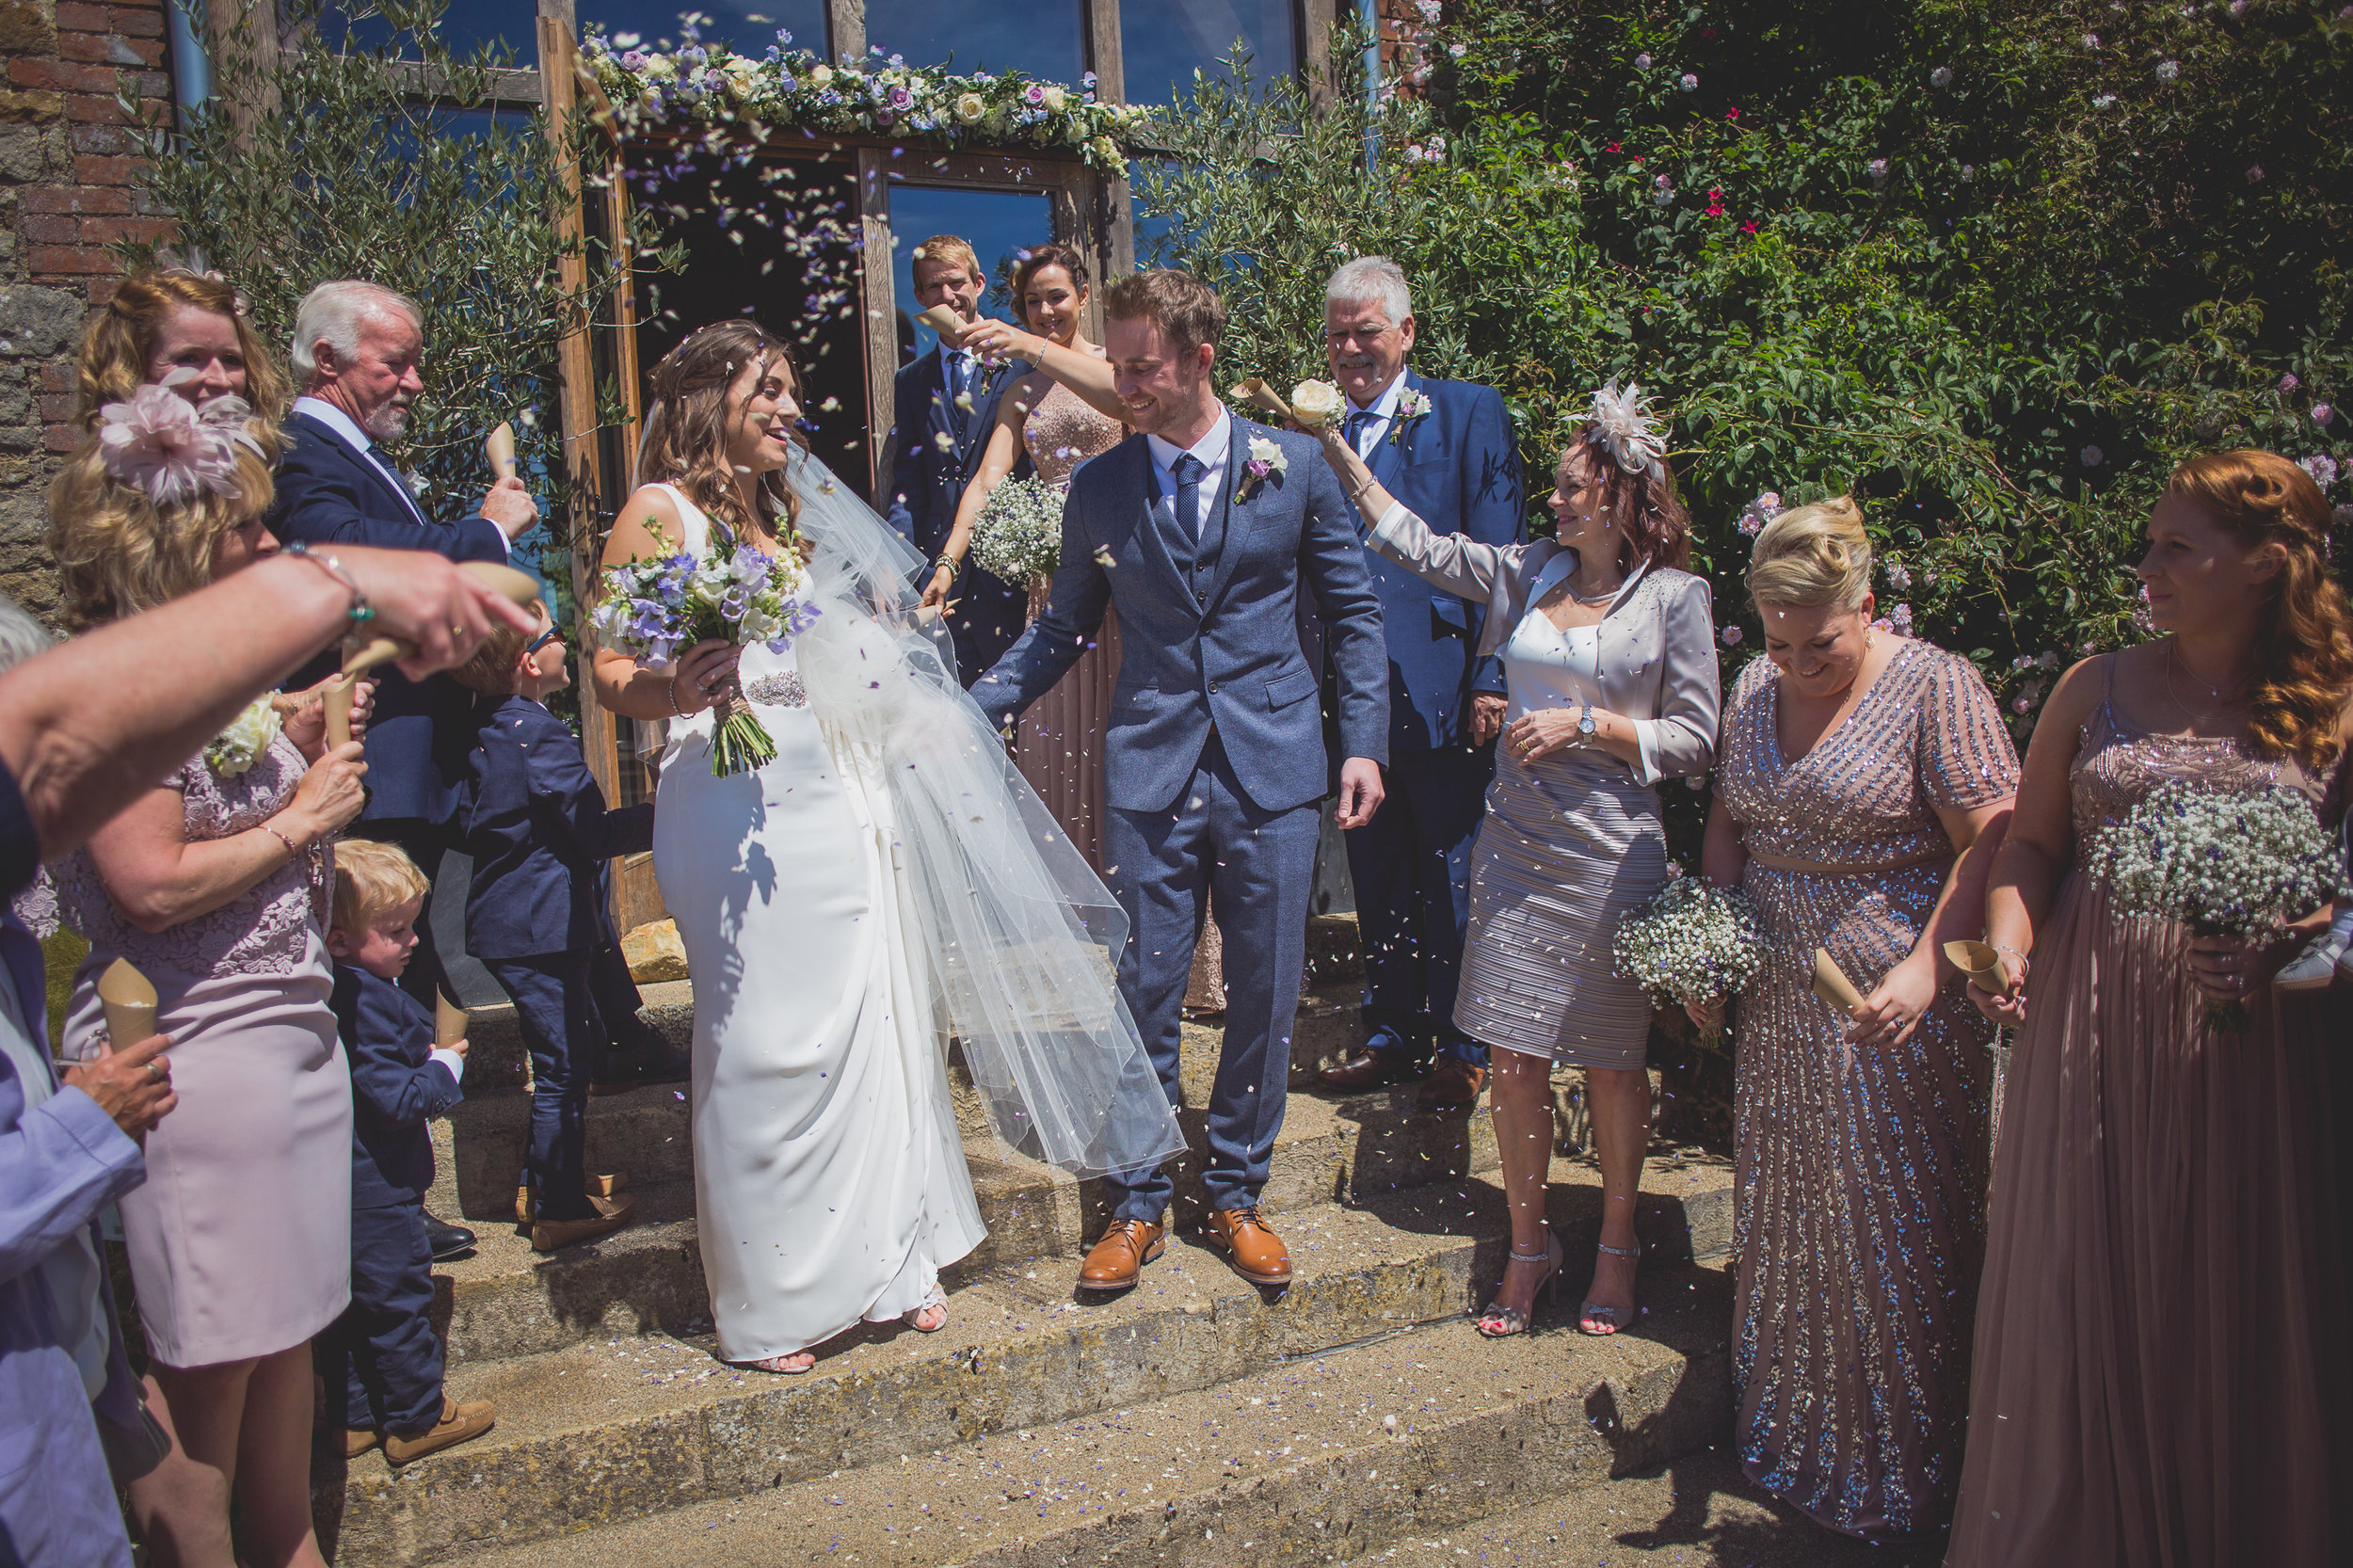 Grittenham Barn female wedding photographers west sussex petworth social-75.jpg